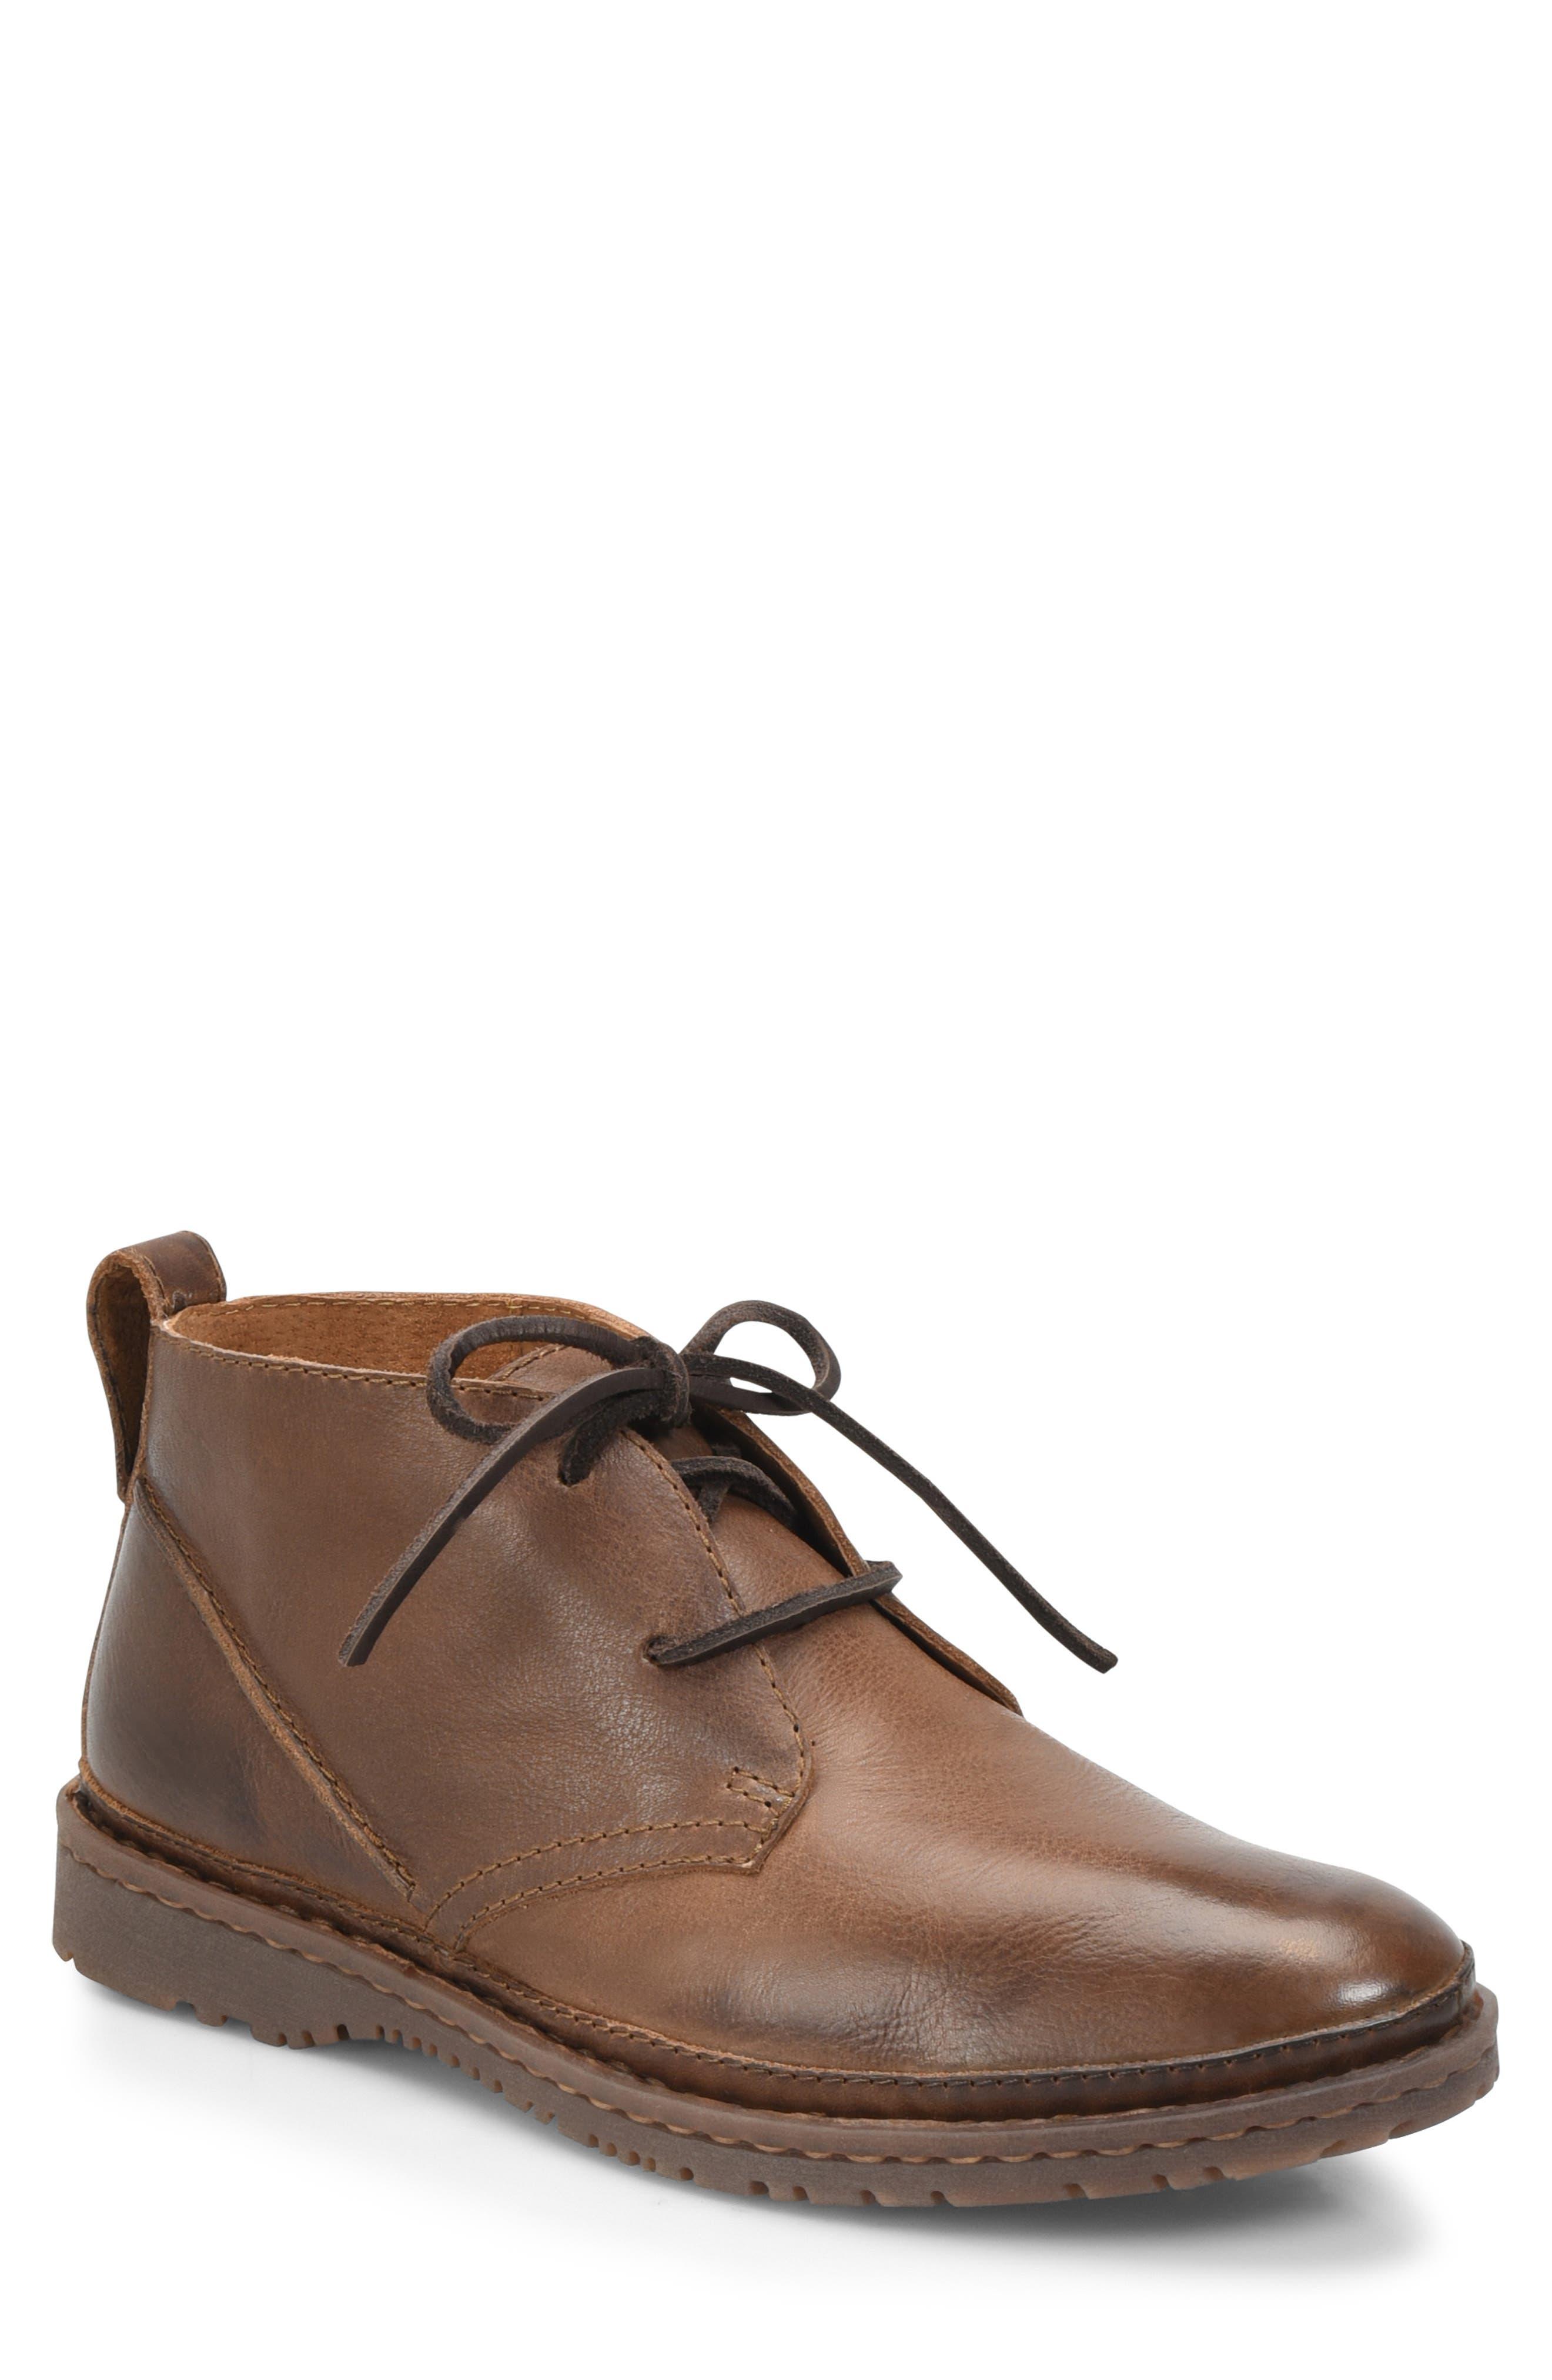 Elk II Chukka Boot,                         Main,                         color, BROWN/BROWN LEATHER